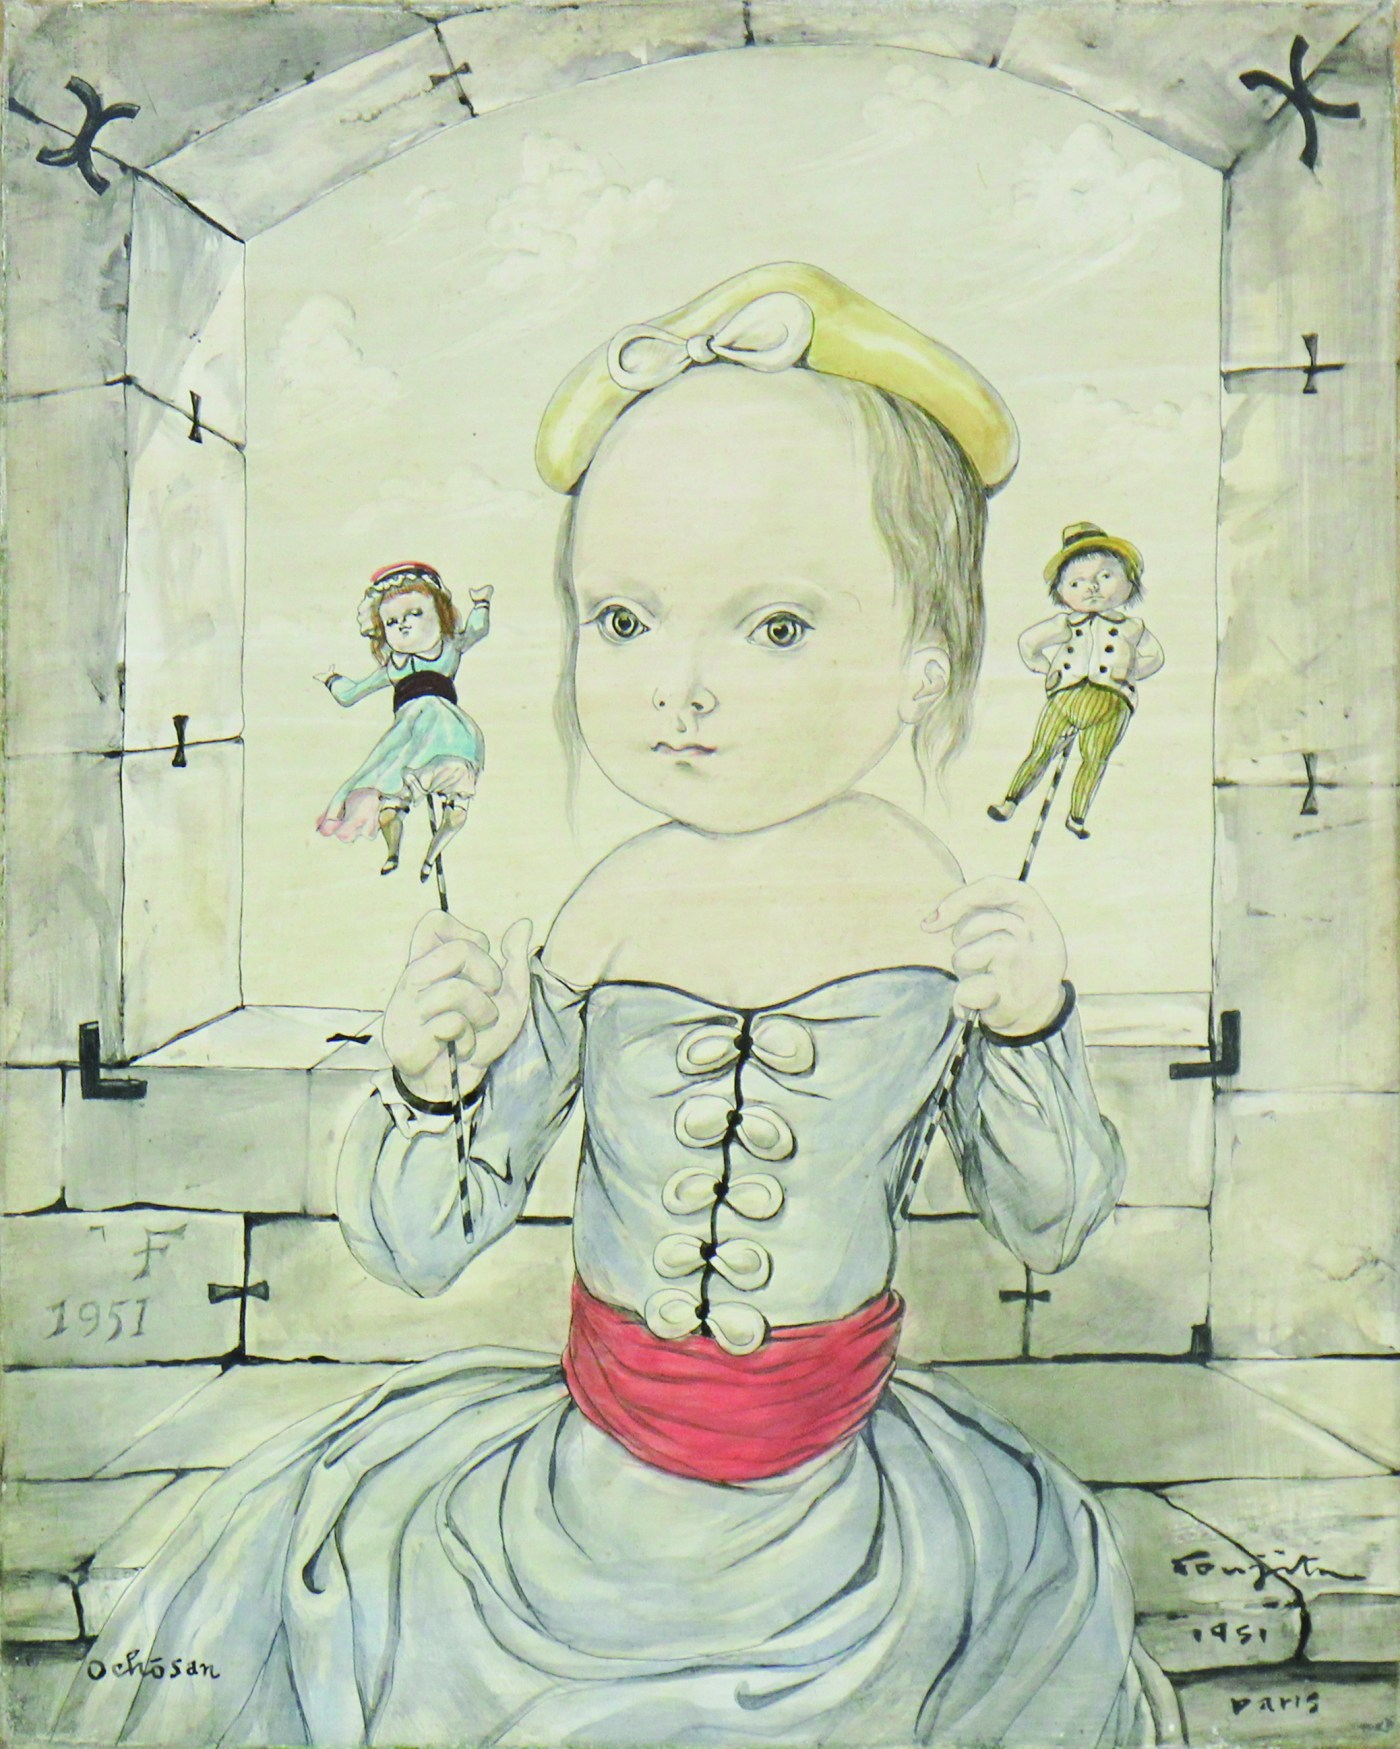 ART TAIPEI 2019 highlight - 藤田嗣治Leonard FOUJITA Dolls and girl 油彩、畫布 24.2x19.3cm 1951